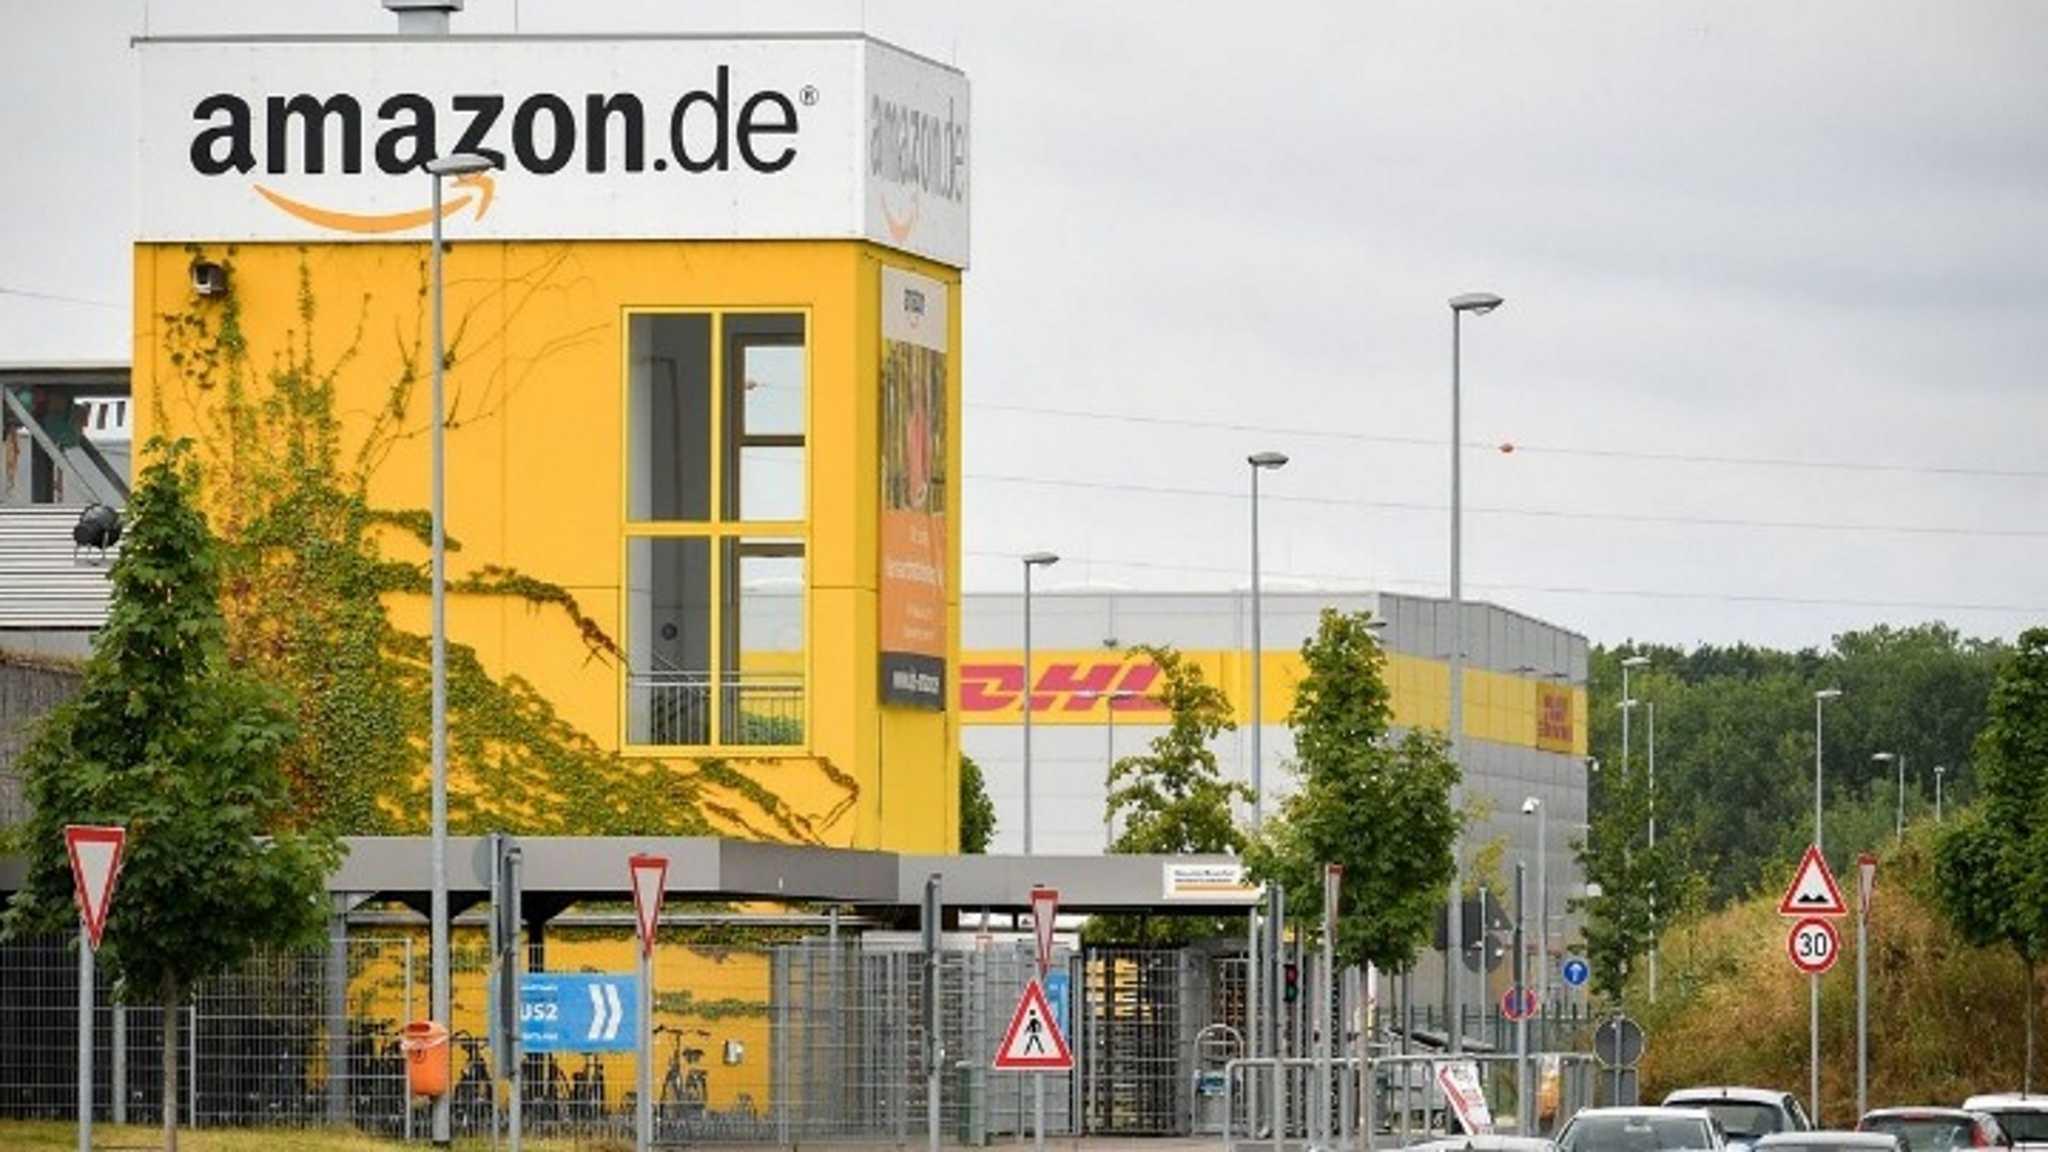 Amazon – Γερμανία: Τετραήμερη απεργία των χιλιάδων εργαζόμενων για τις συνθήκες εργασίας